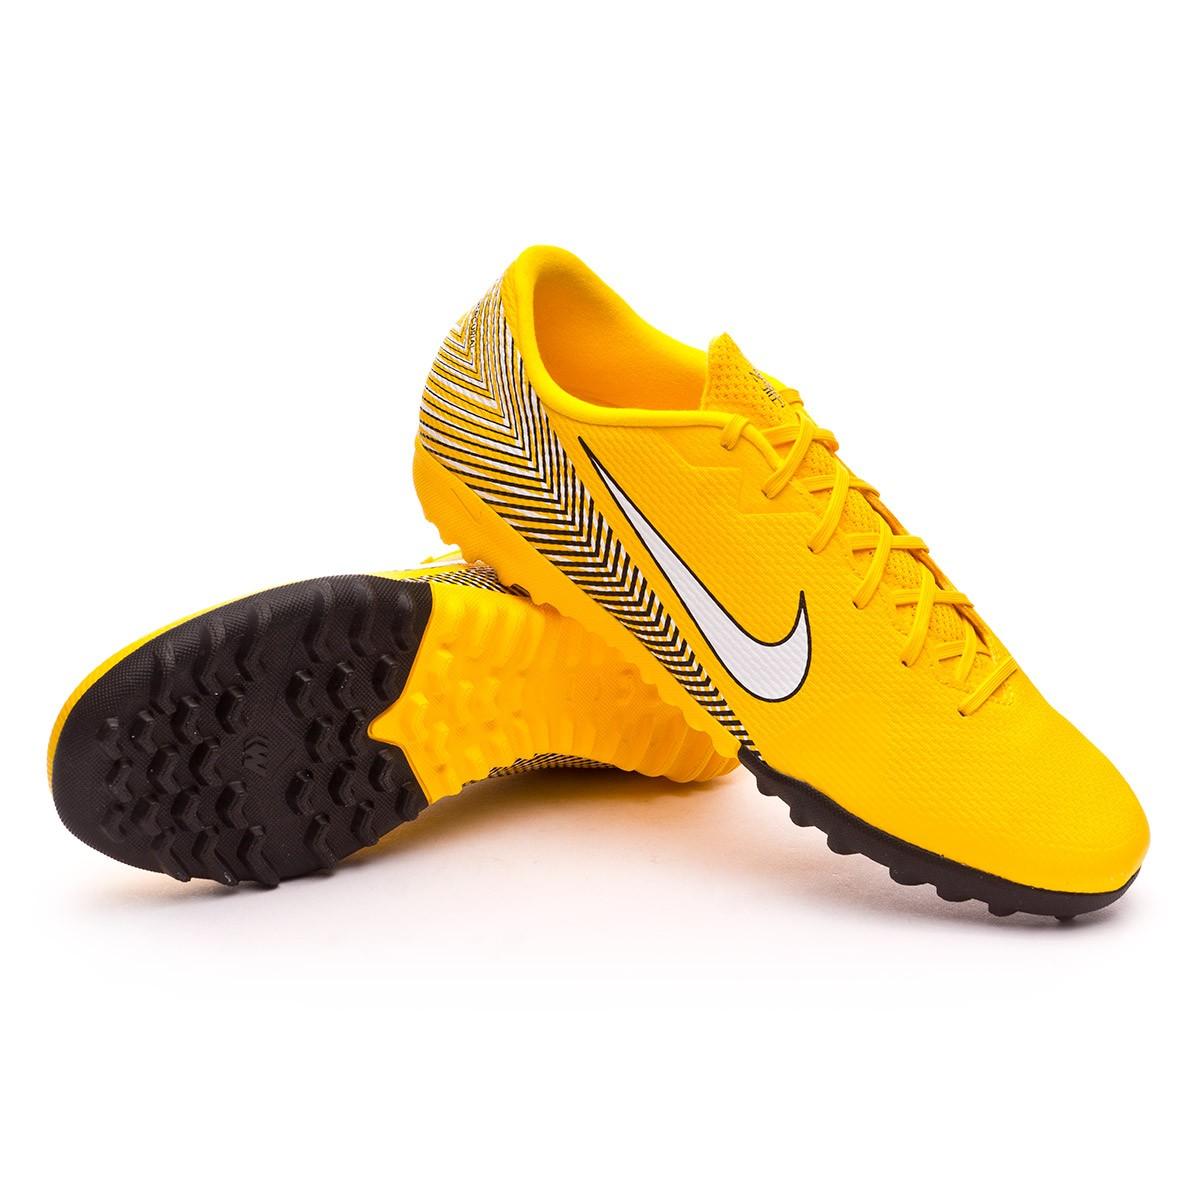 new styles 98490 64d68 Zapatilla Mercurial VaporX XII Academy Turf Neymar Yellow-Black